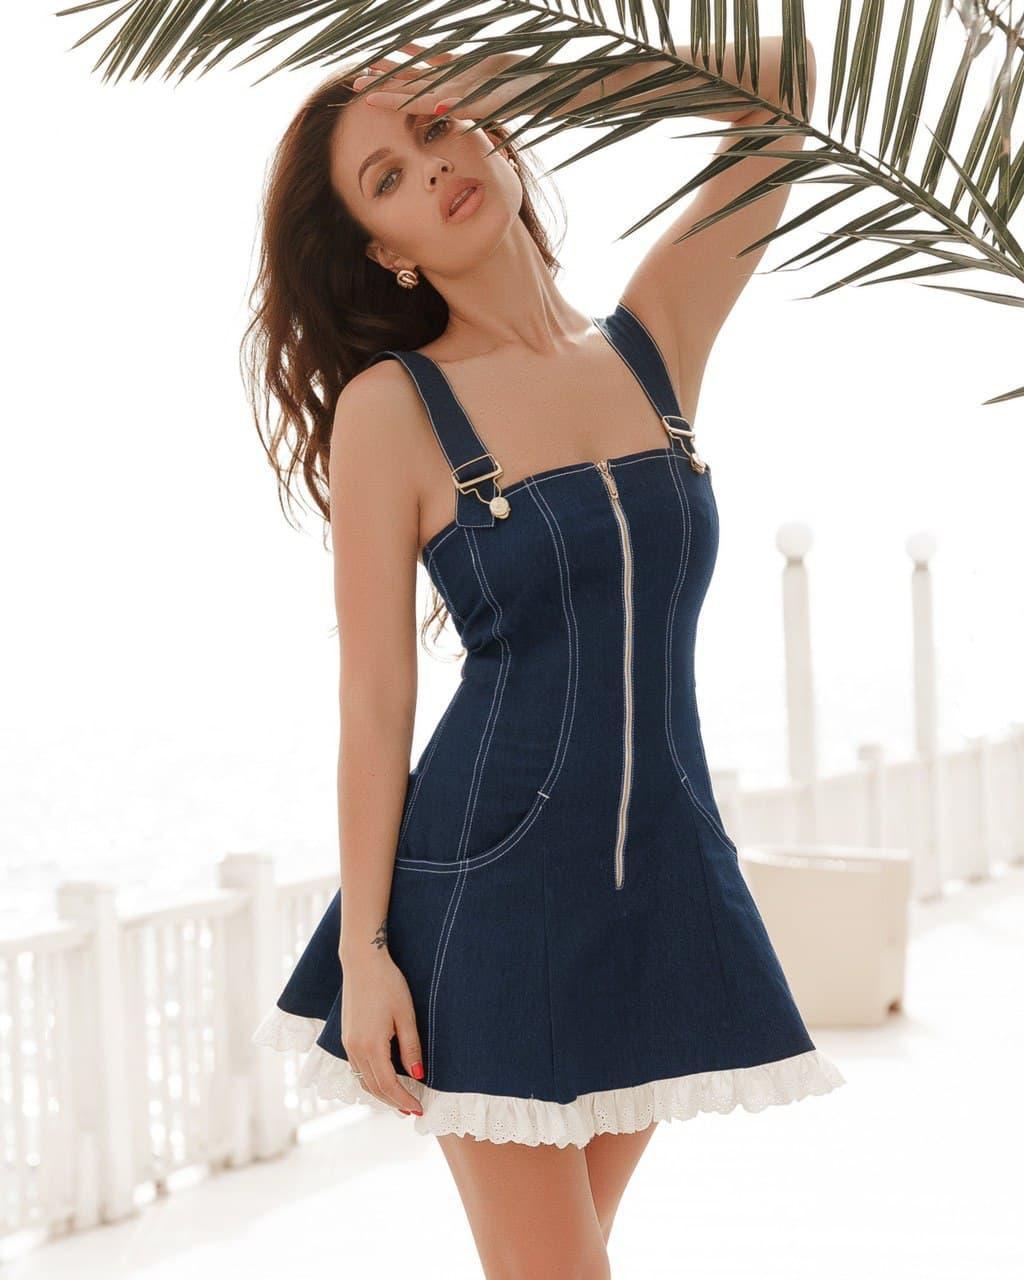 Сарафан женский джинсовый мини AniTi 543, синий